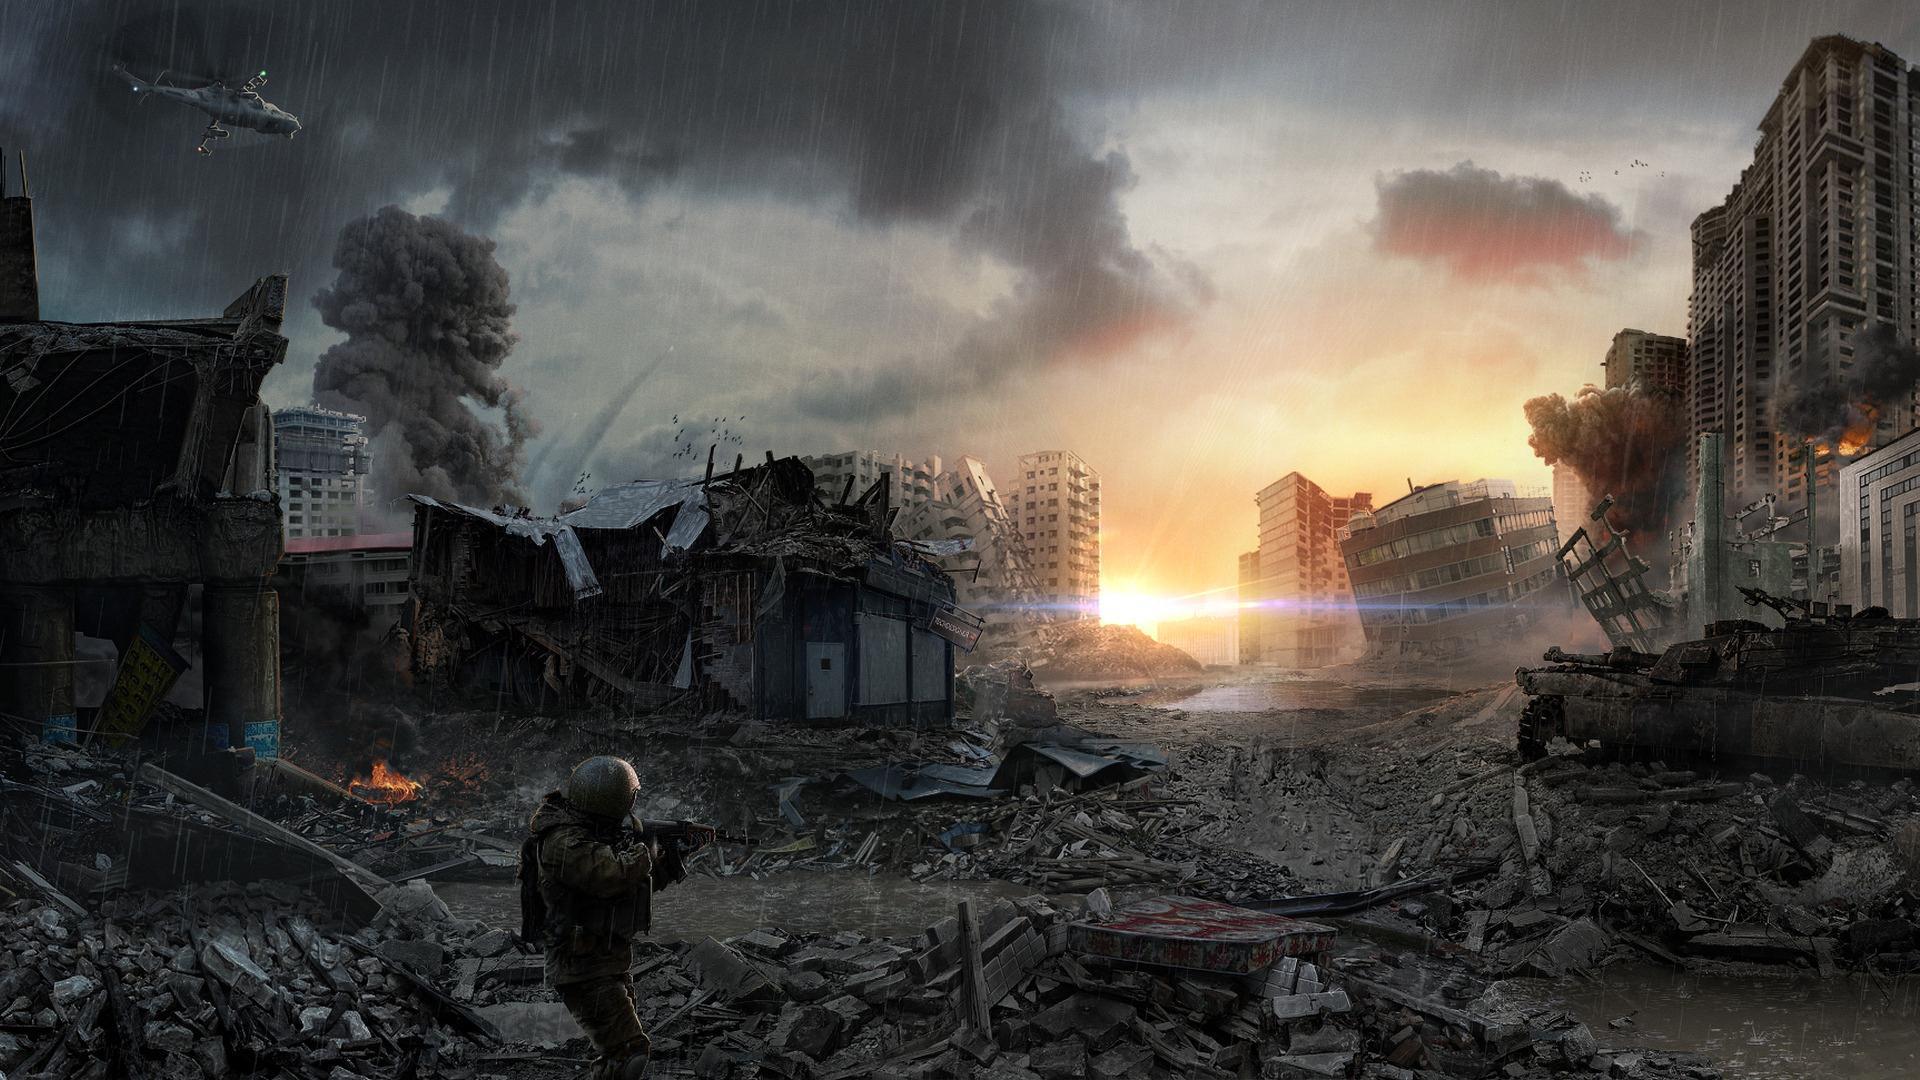 Apocalypse Wallpapers Top Free Apocalypse Backgrounds